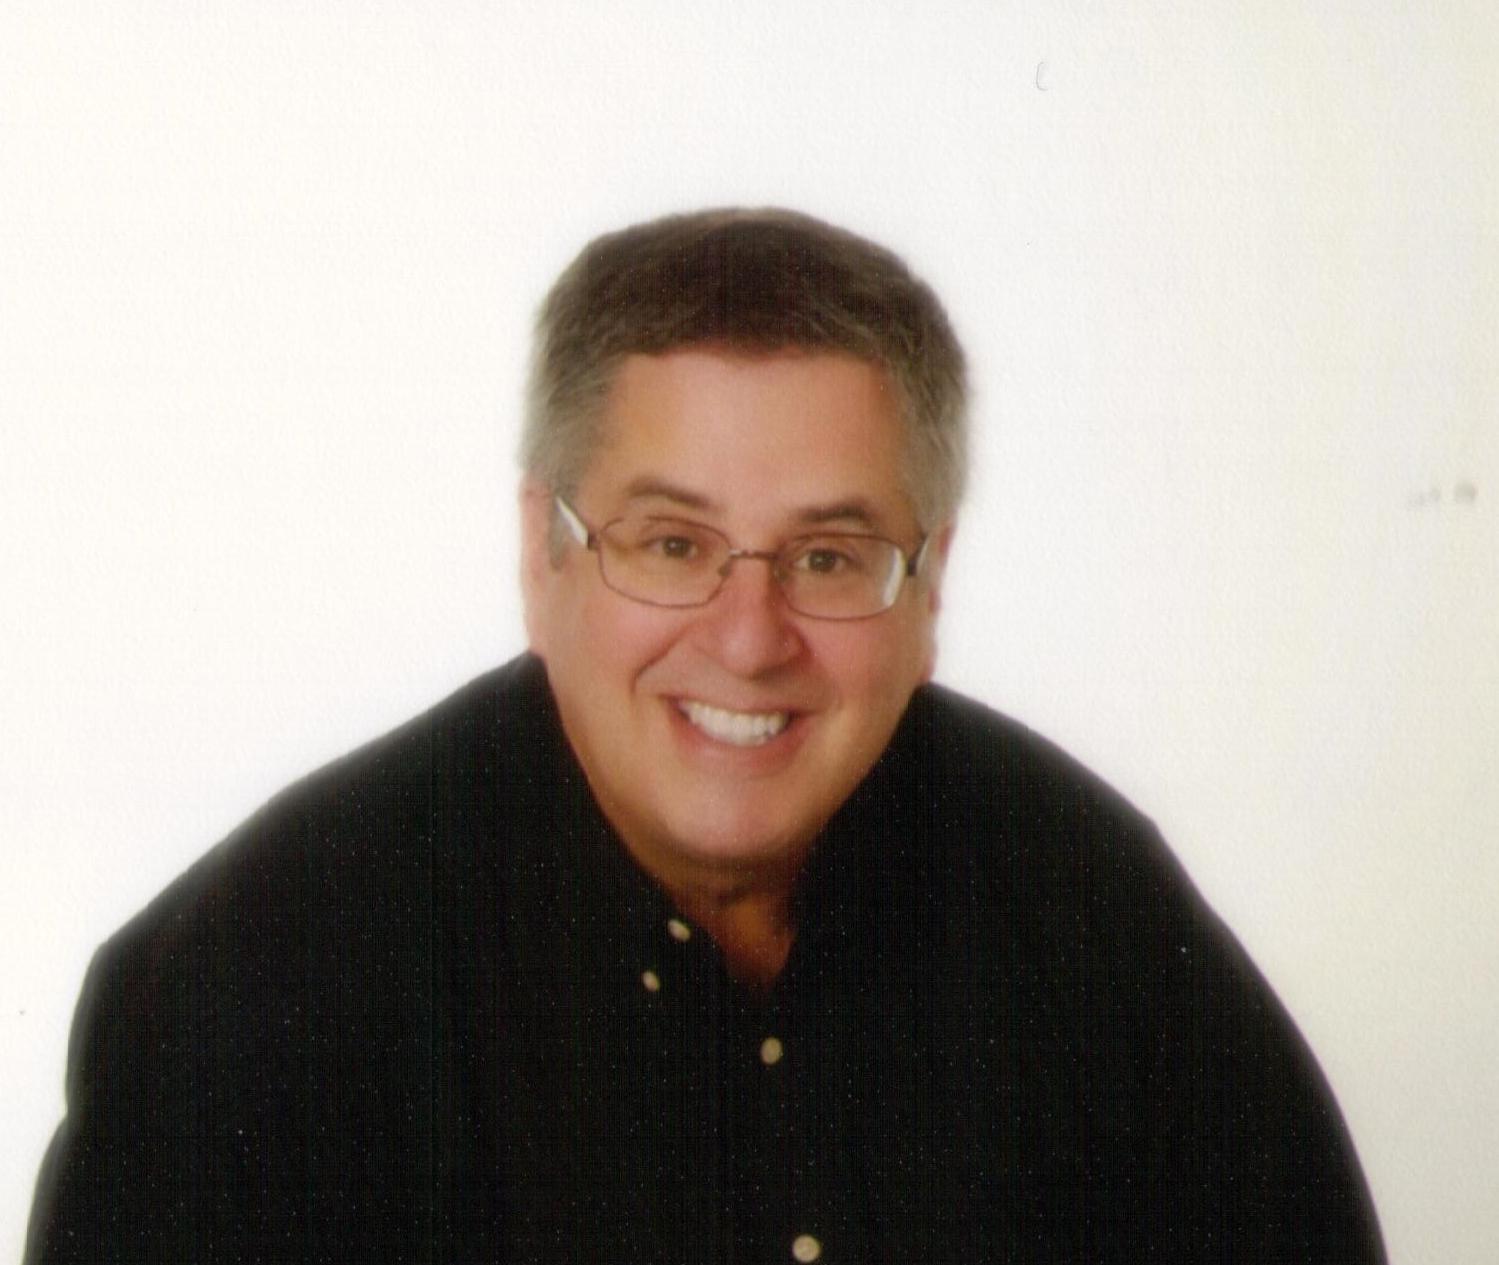 Michael Fruhling